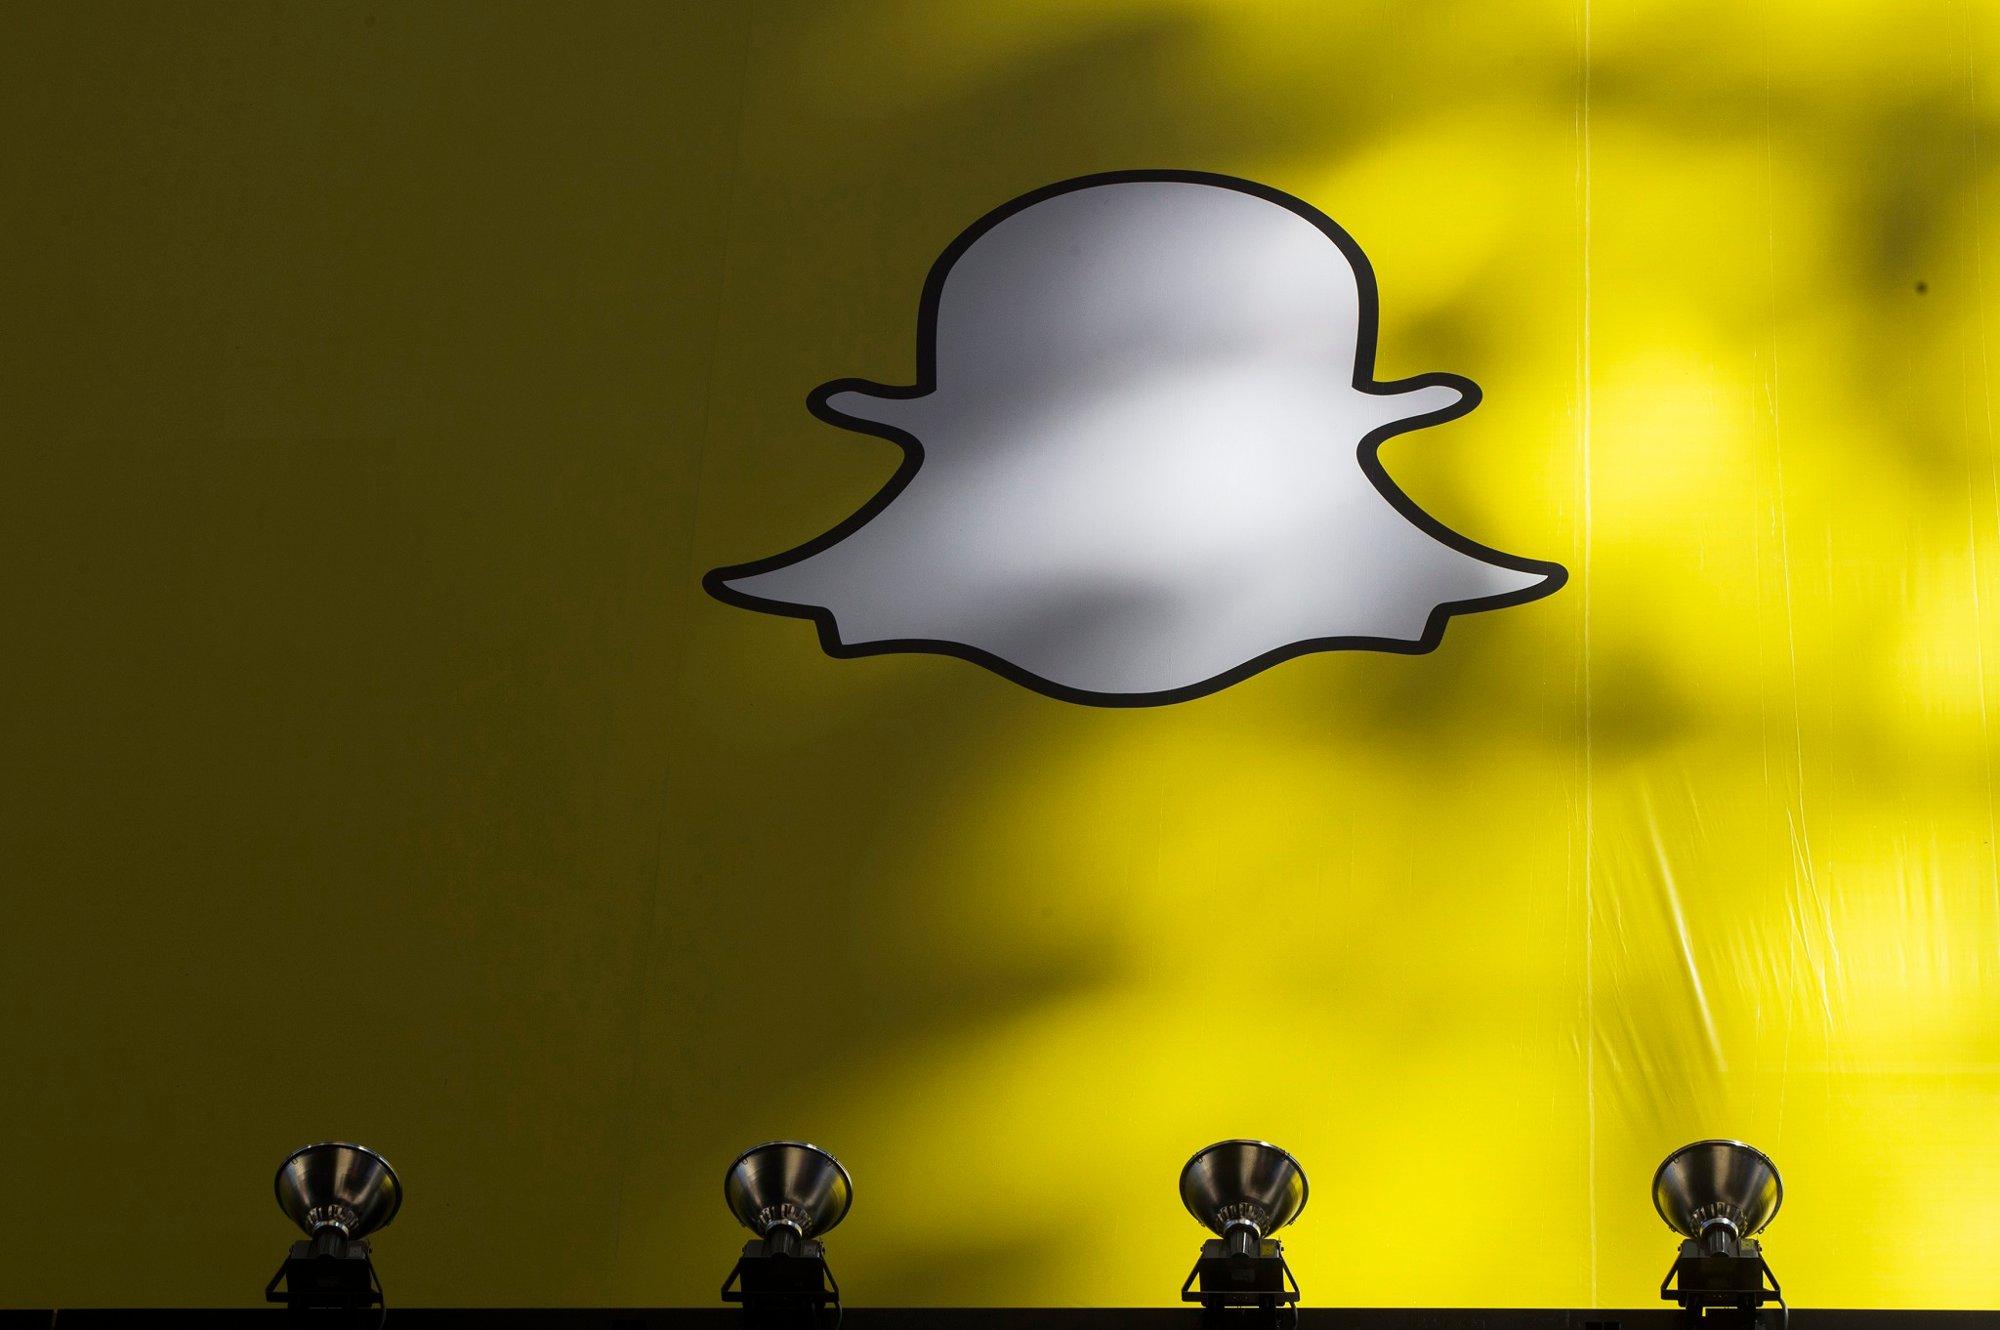 Konto norsk nakenbilder snapchat Best free